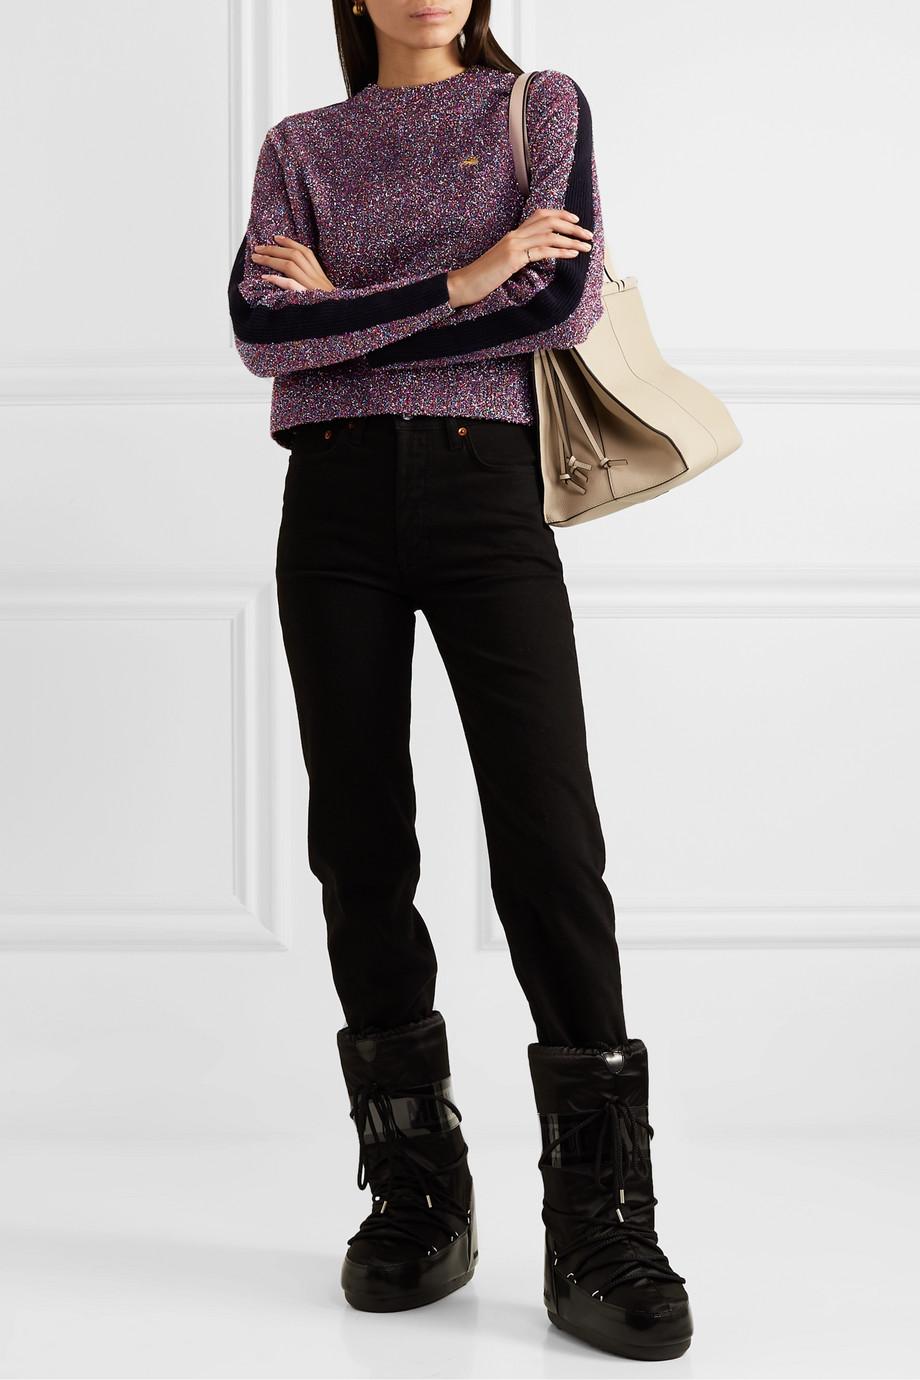 Bella Freud Teeny Bopper Pullover aus Strick in Metallic-Optik